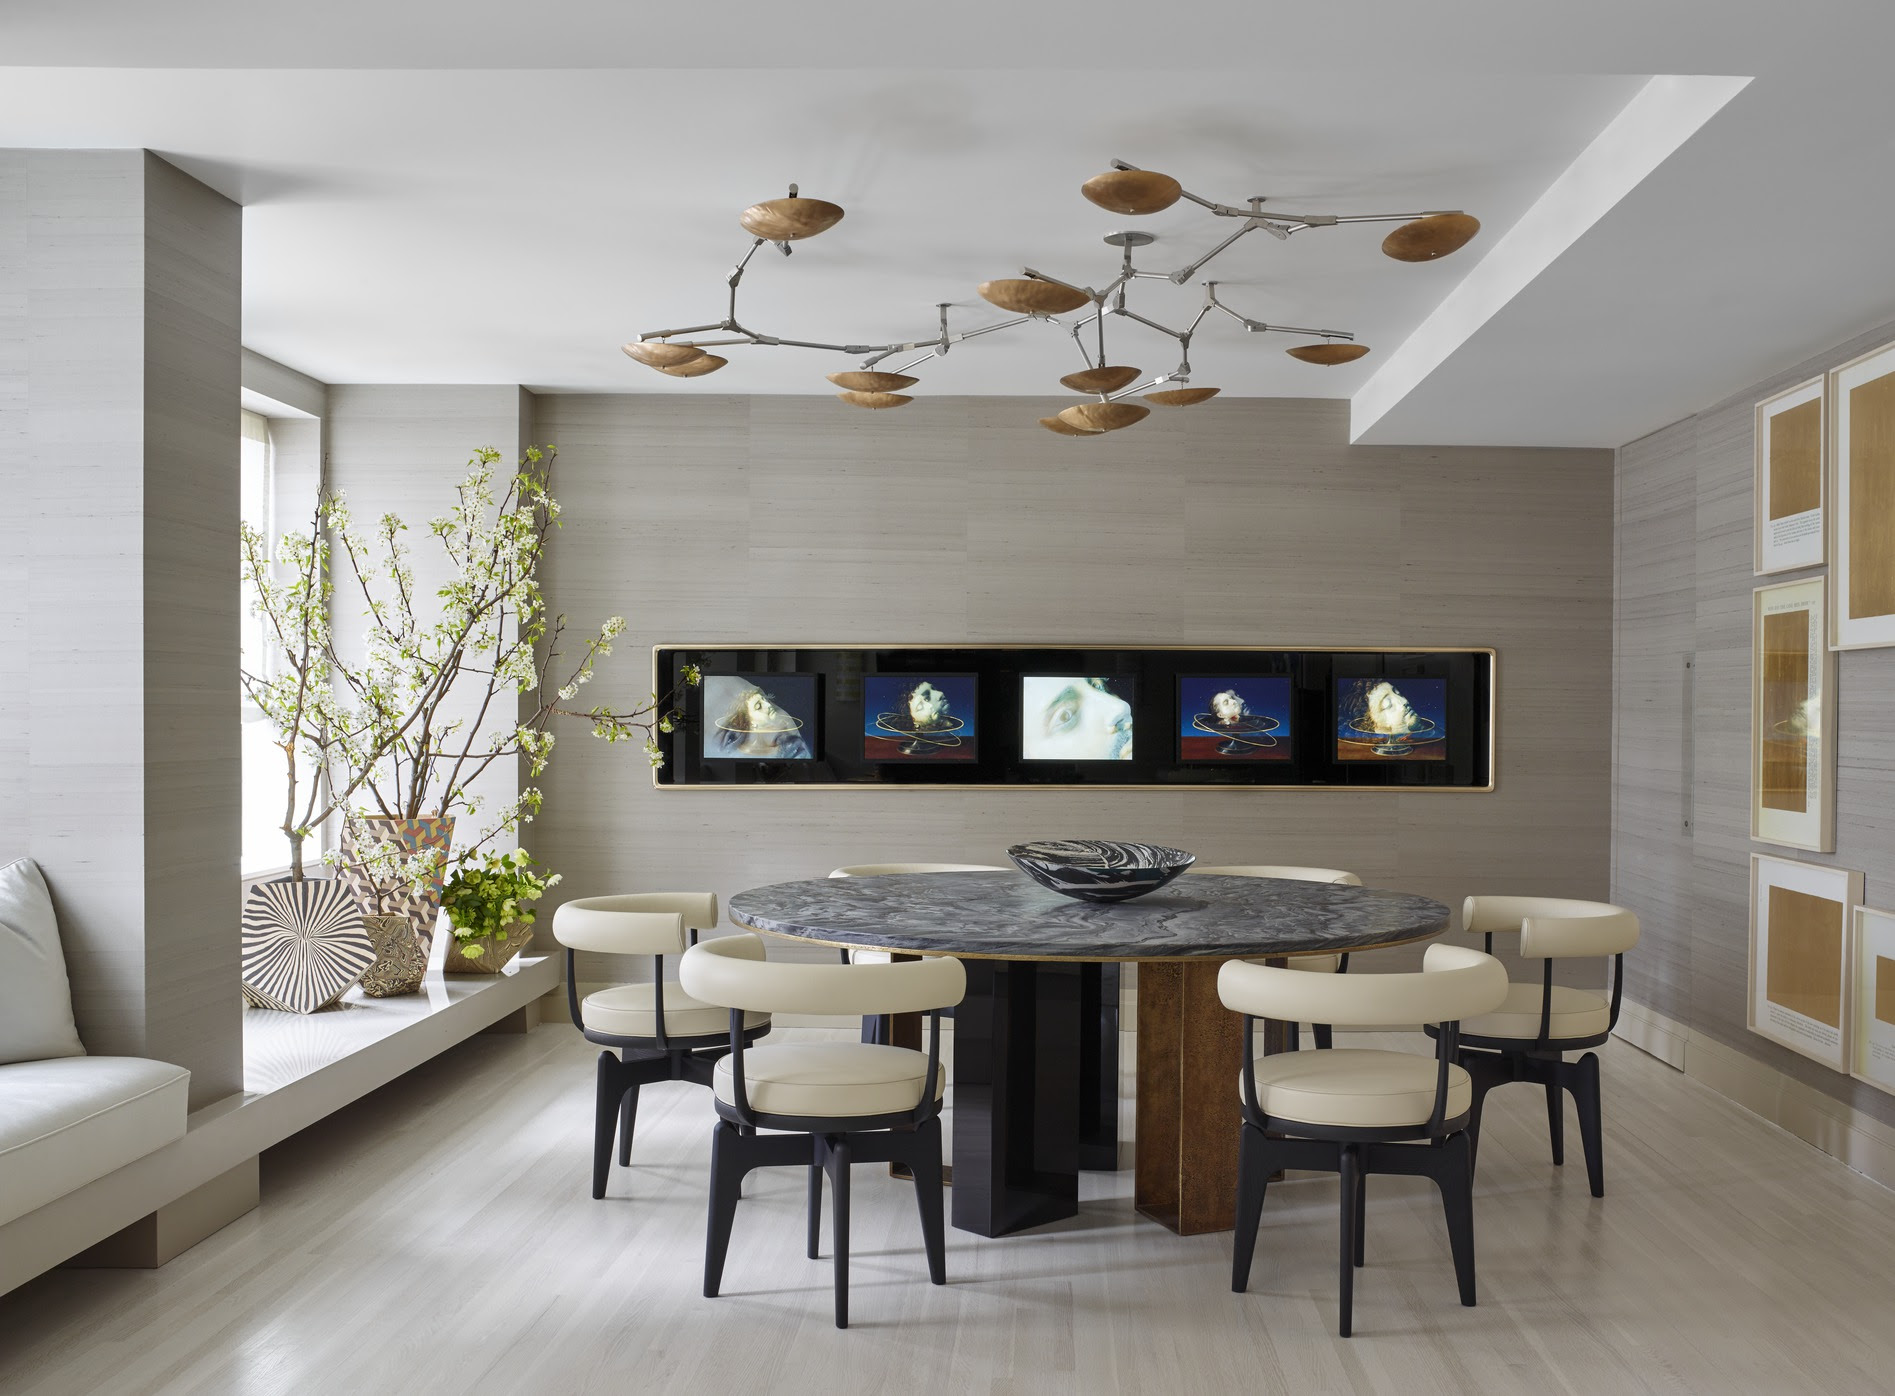 25 Modern Dining Room Decorating Ideas - Contemporary ...